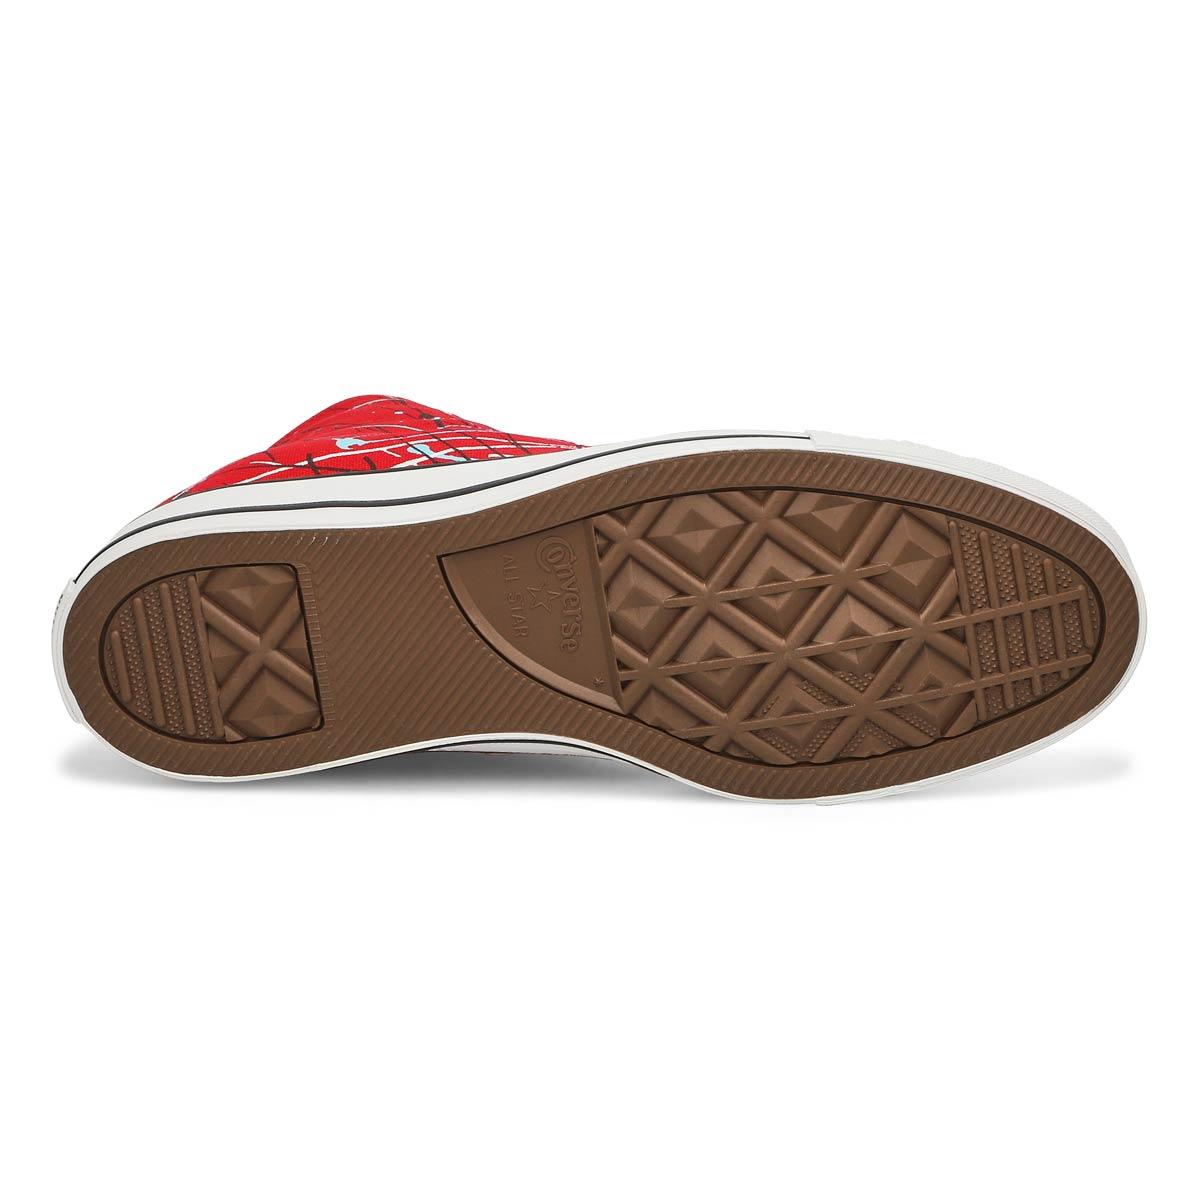 Men's All Star Paint Splatter Hi Top Sneaker